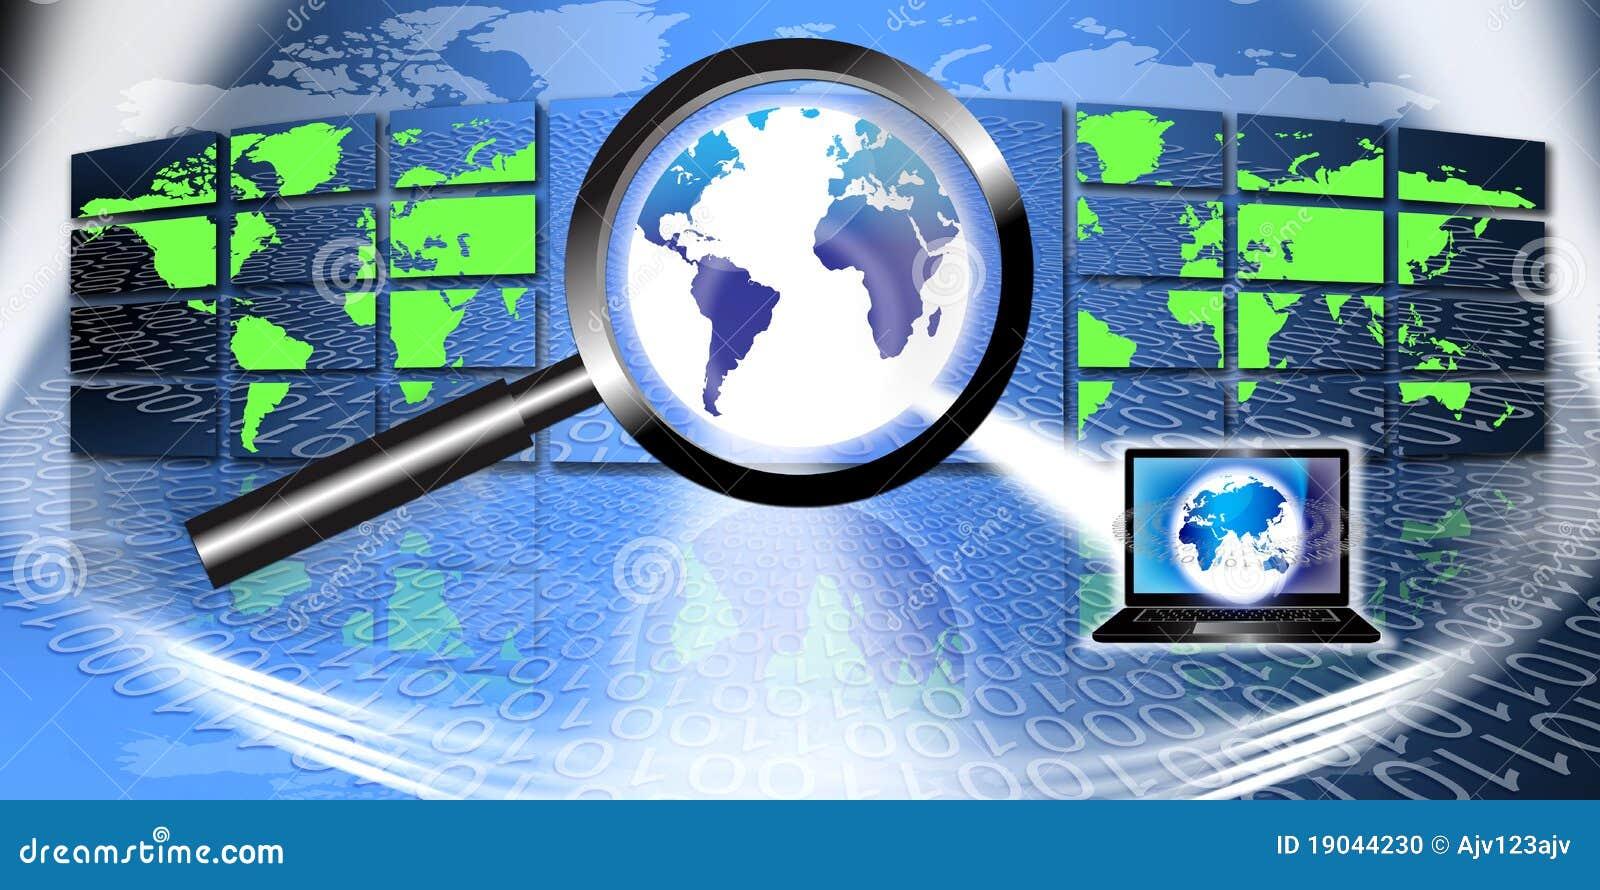 Information Technology Fraud Investigation